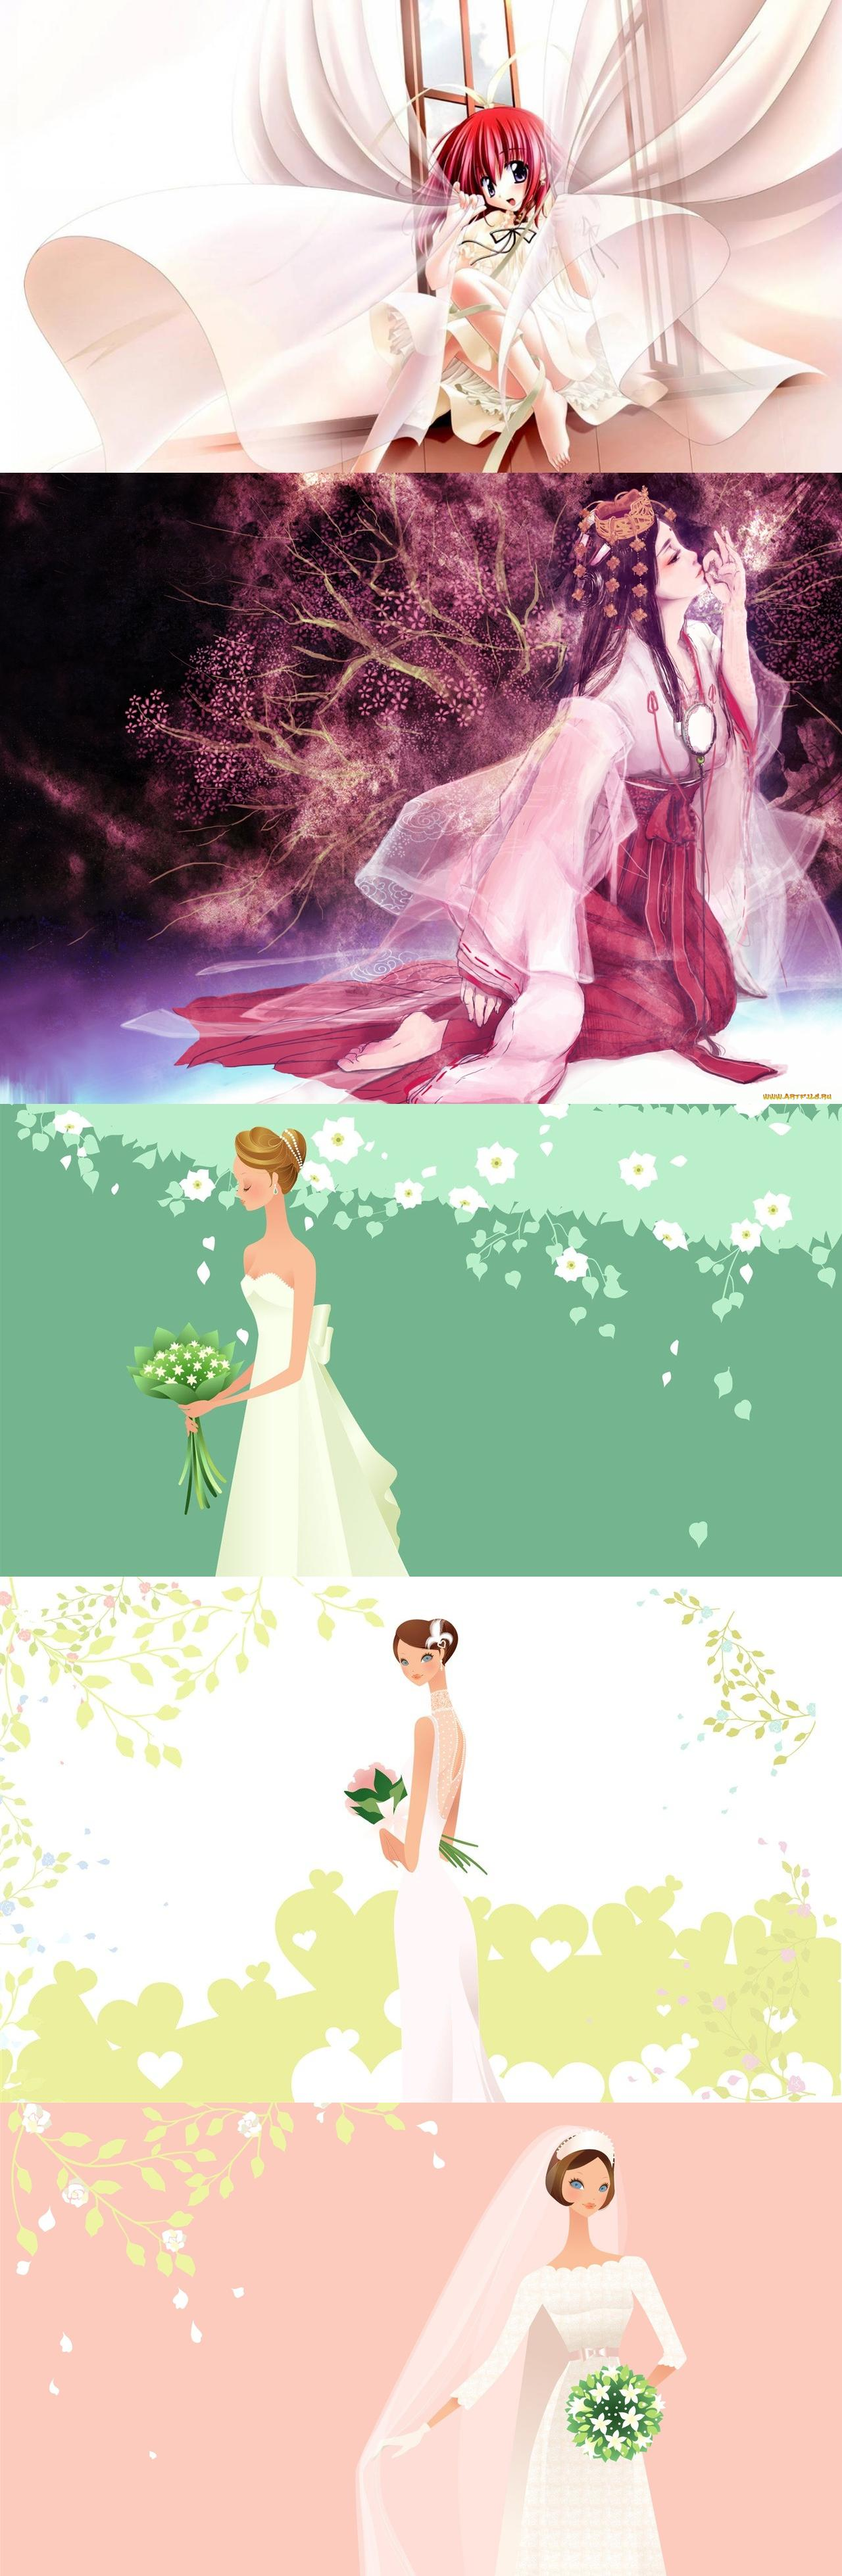 anime wedding dress | anime | Pinterest | Anime wedding